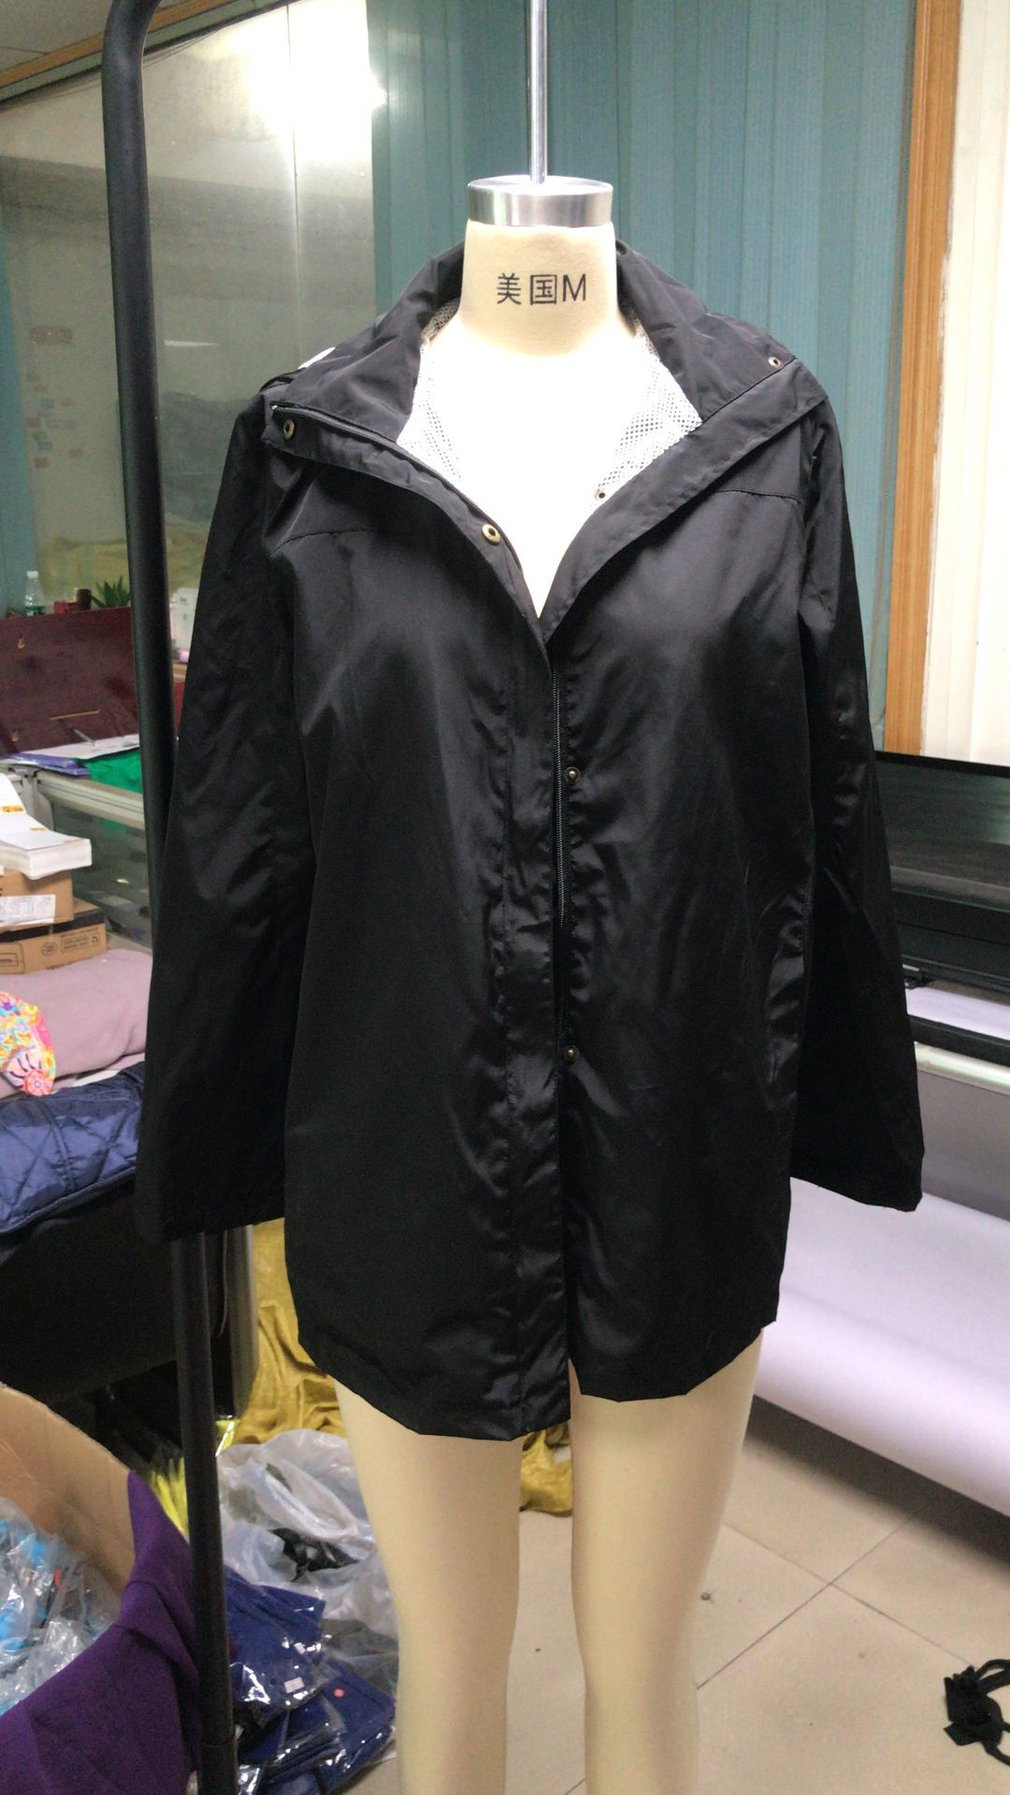 Sports Jacket Windproof Waterproof Bike Clothing Rainproof Jersey Breathable Windbreaker Running Cycling Rain Jacket|Hiking Jackets| |  - title=